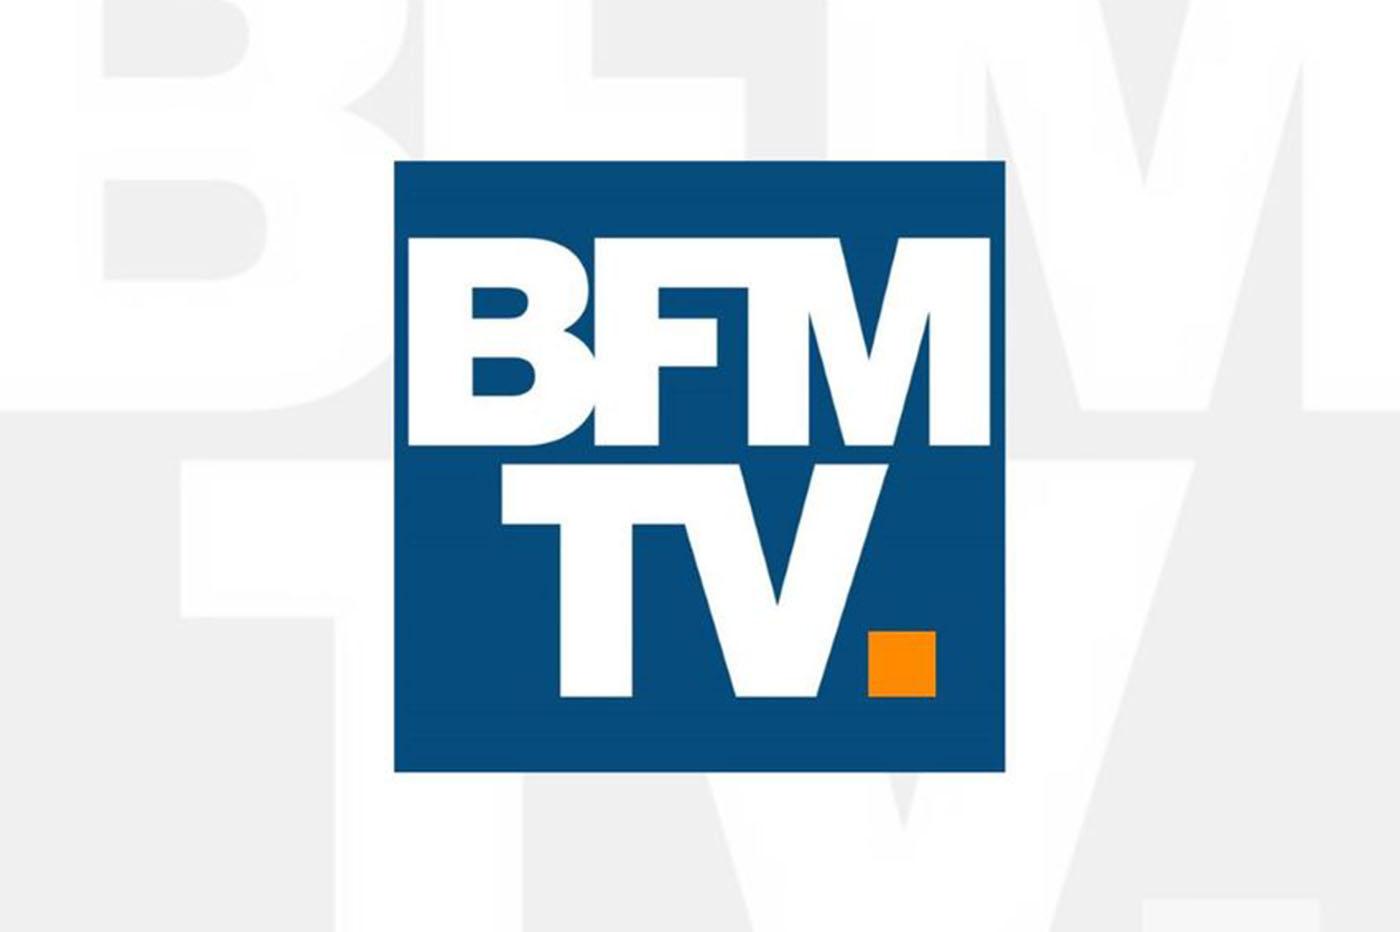 BFMTV Orange